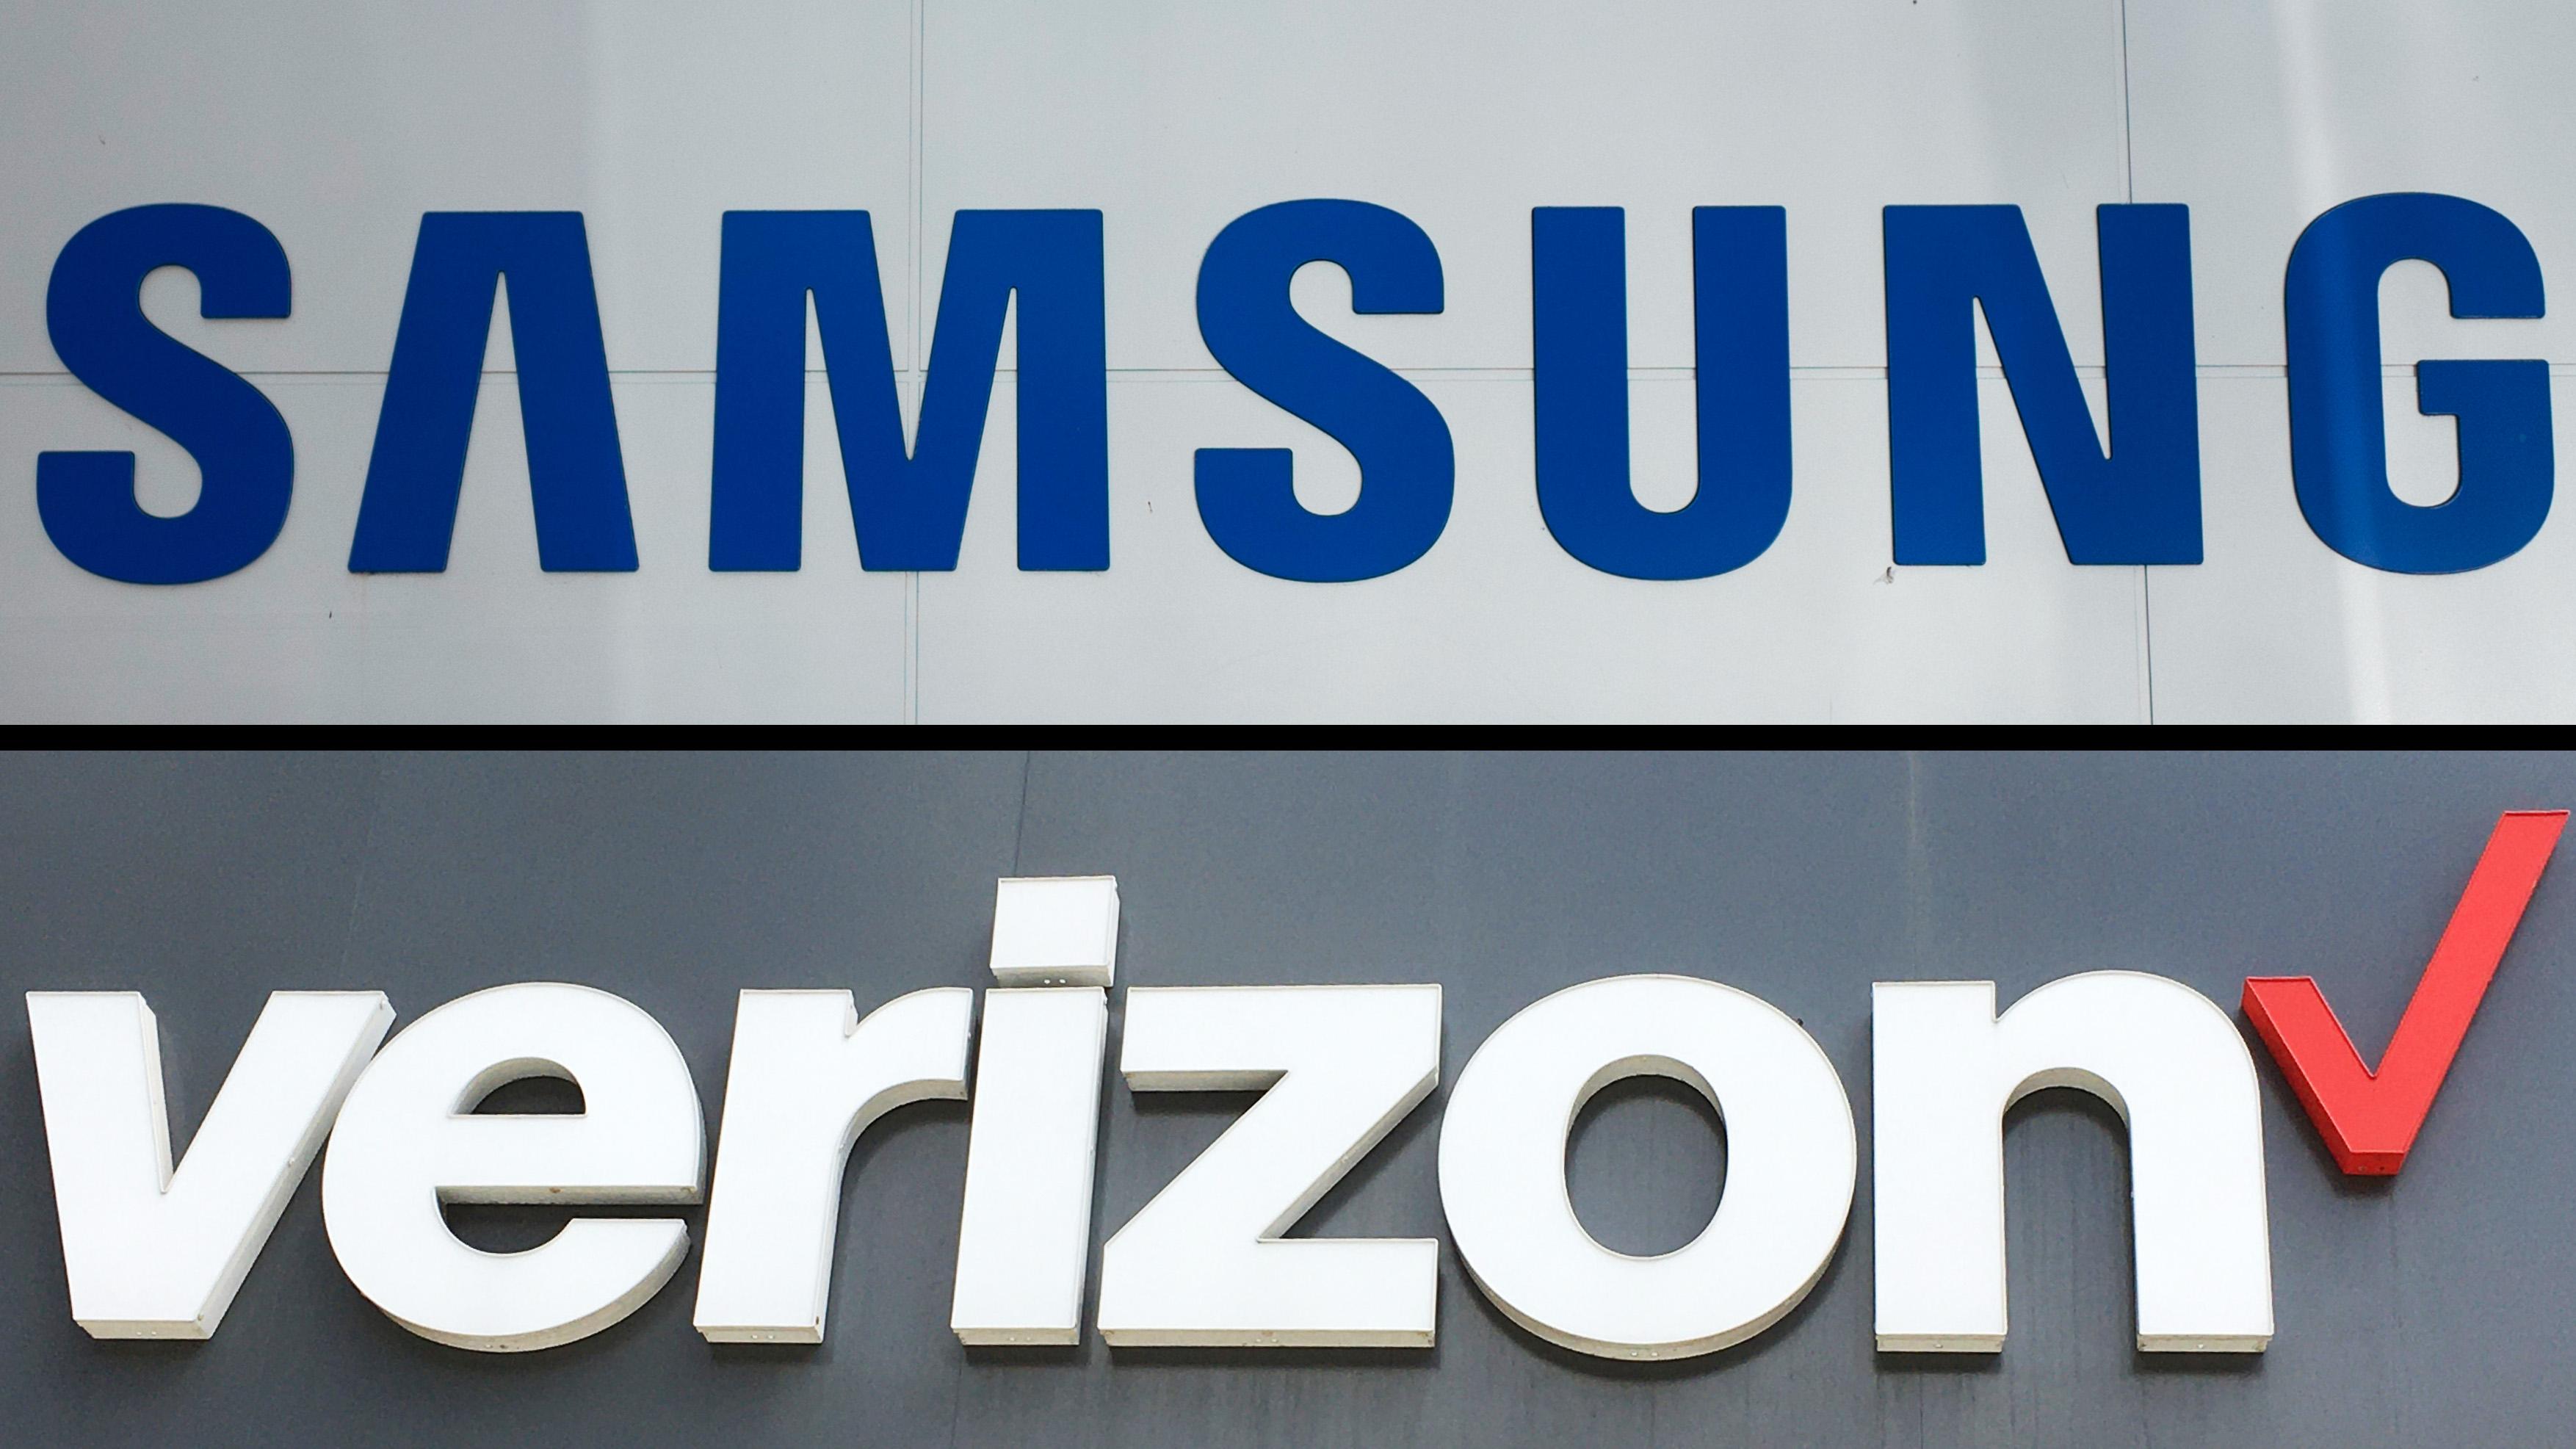 Samsung wins $6.6bn order from Verizon for 5G telecom gear